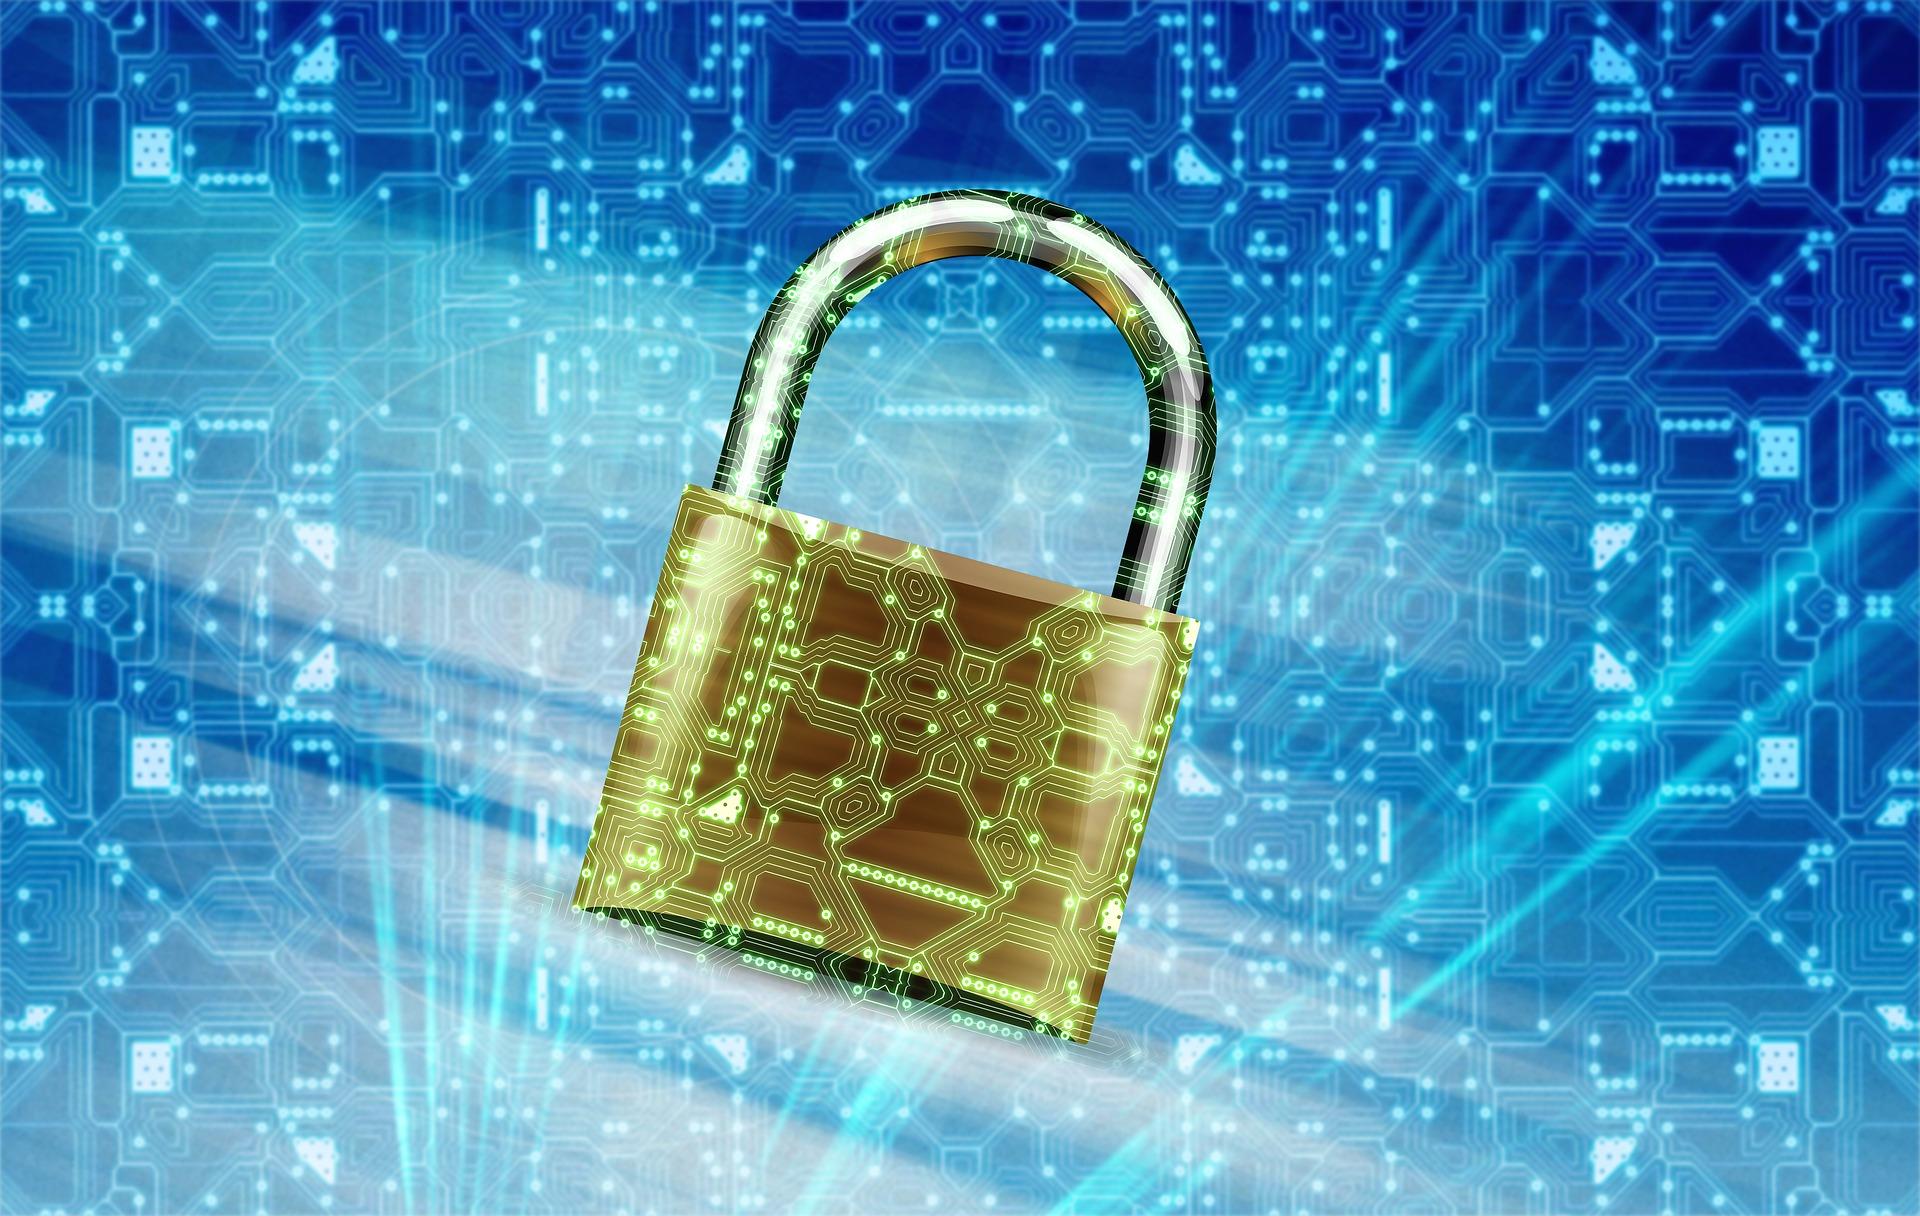 CFDDesk security